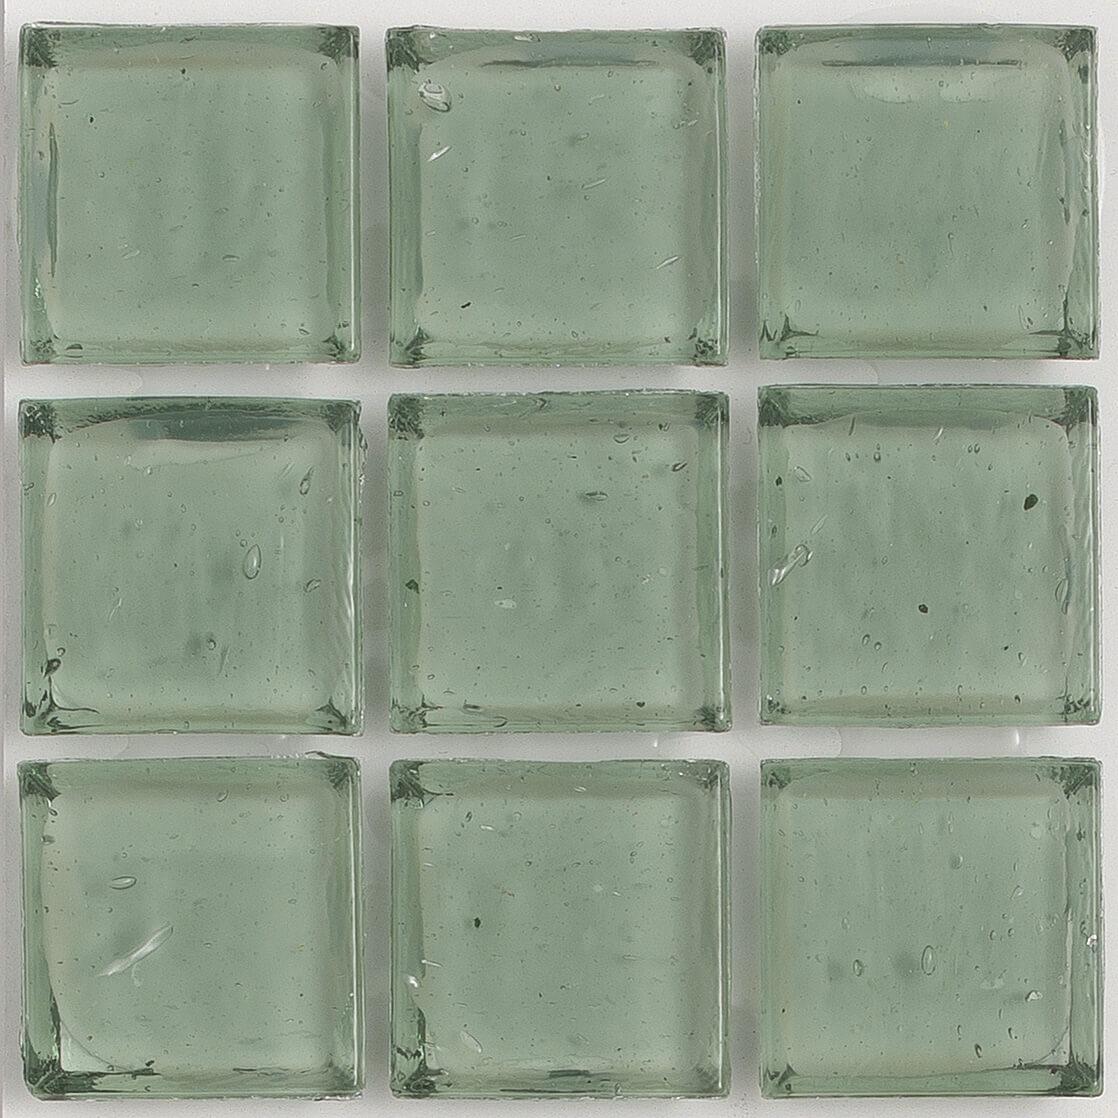 267.01 Tremolite Clear